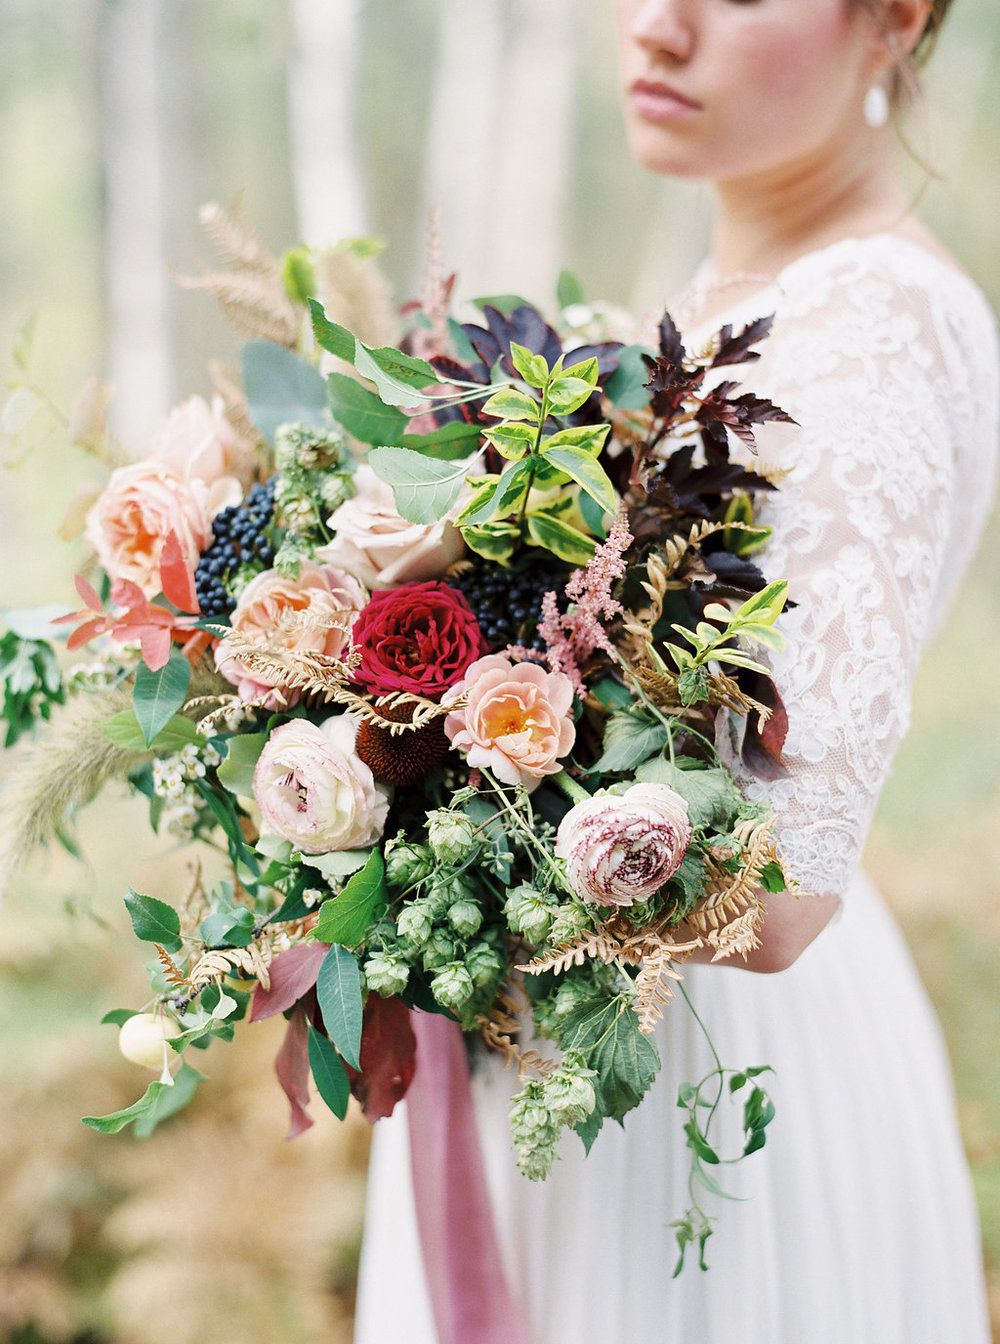 Trailing bridal bouquet with ranunculus, hops, and garden roses // Destination Florist